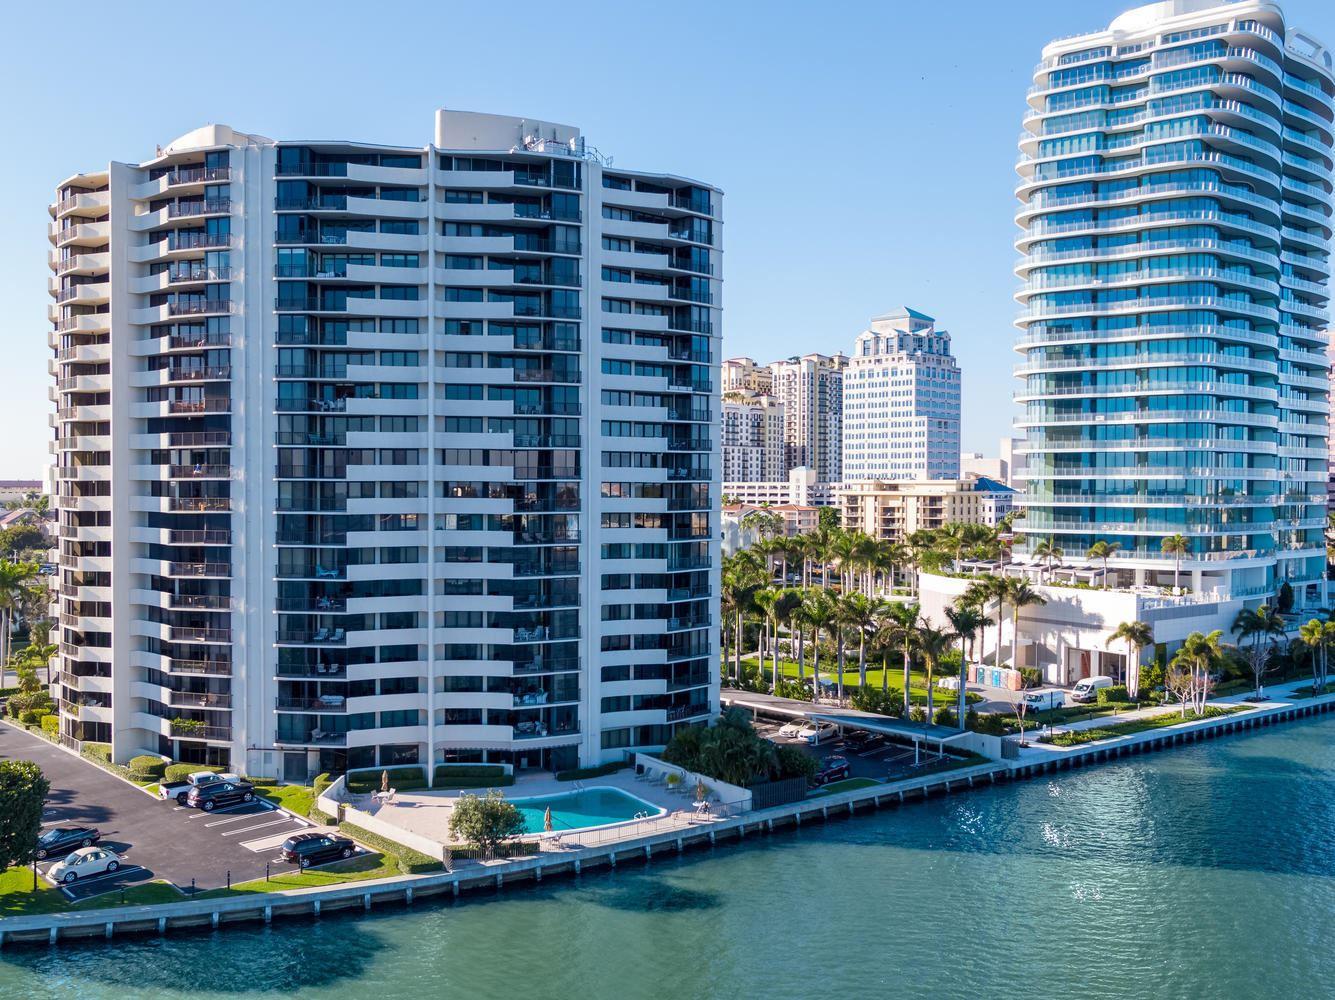 1200 S Flagler Drive #403, West Palm Beach, FL 33401 - #: RX-10566722